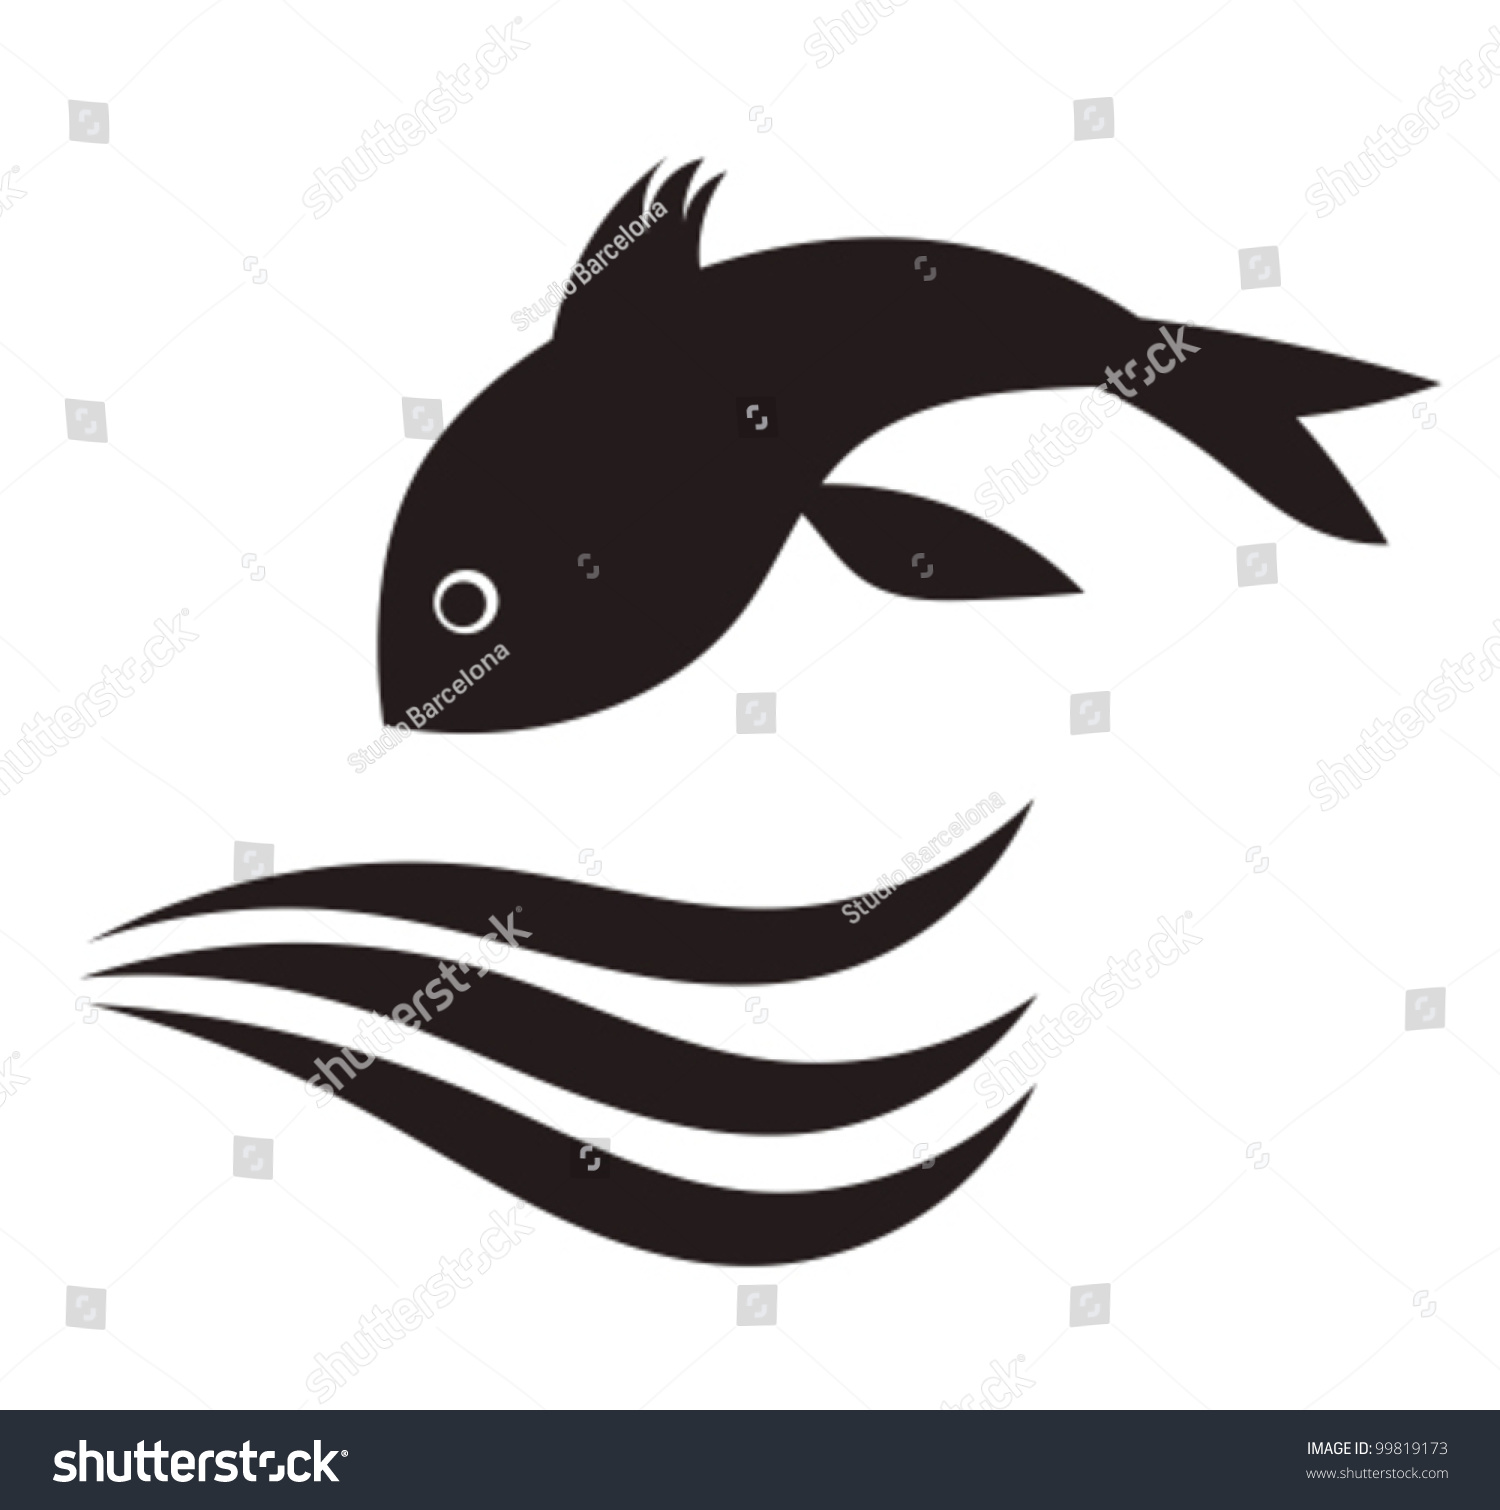 Freshwater fish jumping - Fish Jumping In Water Vector Illustration